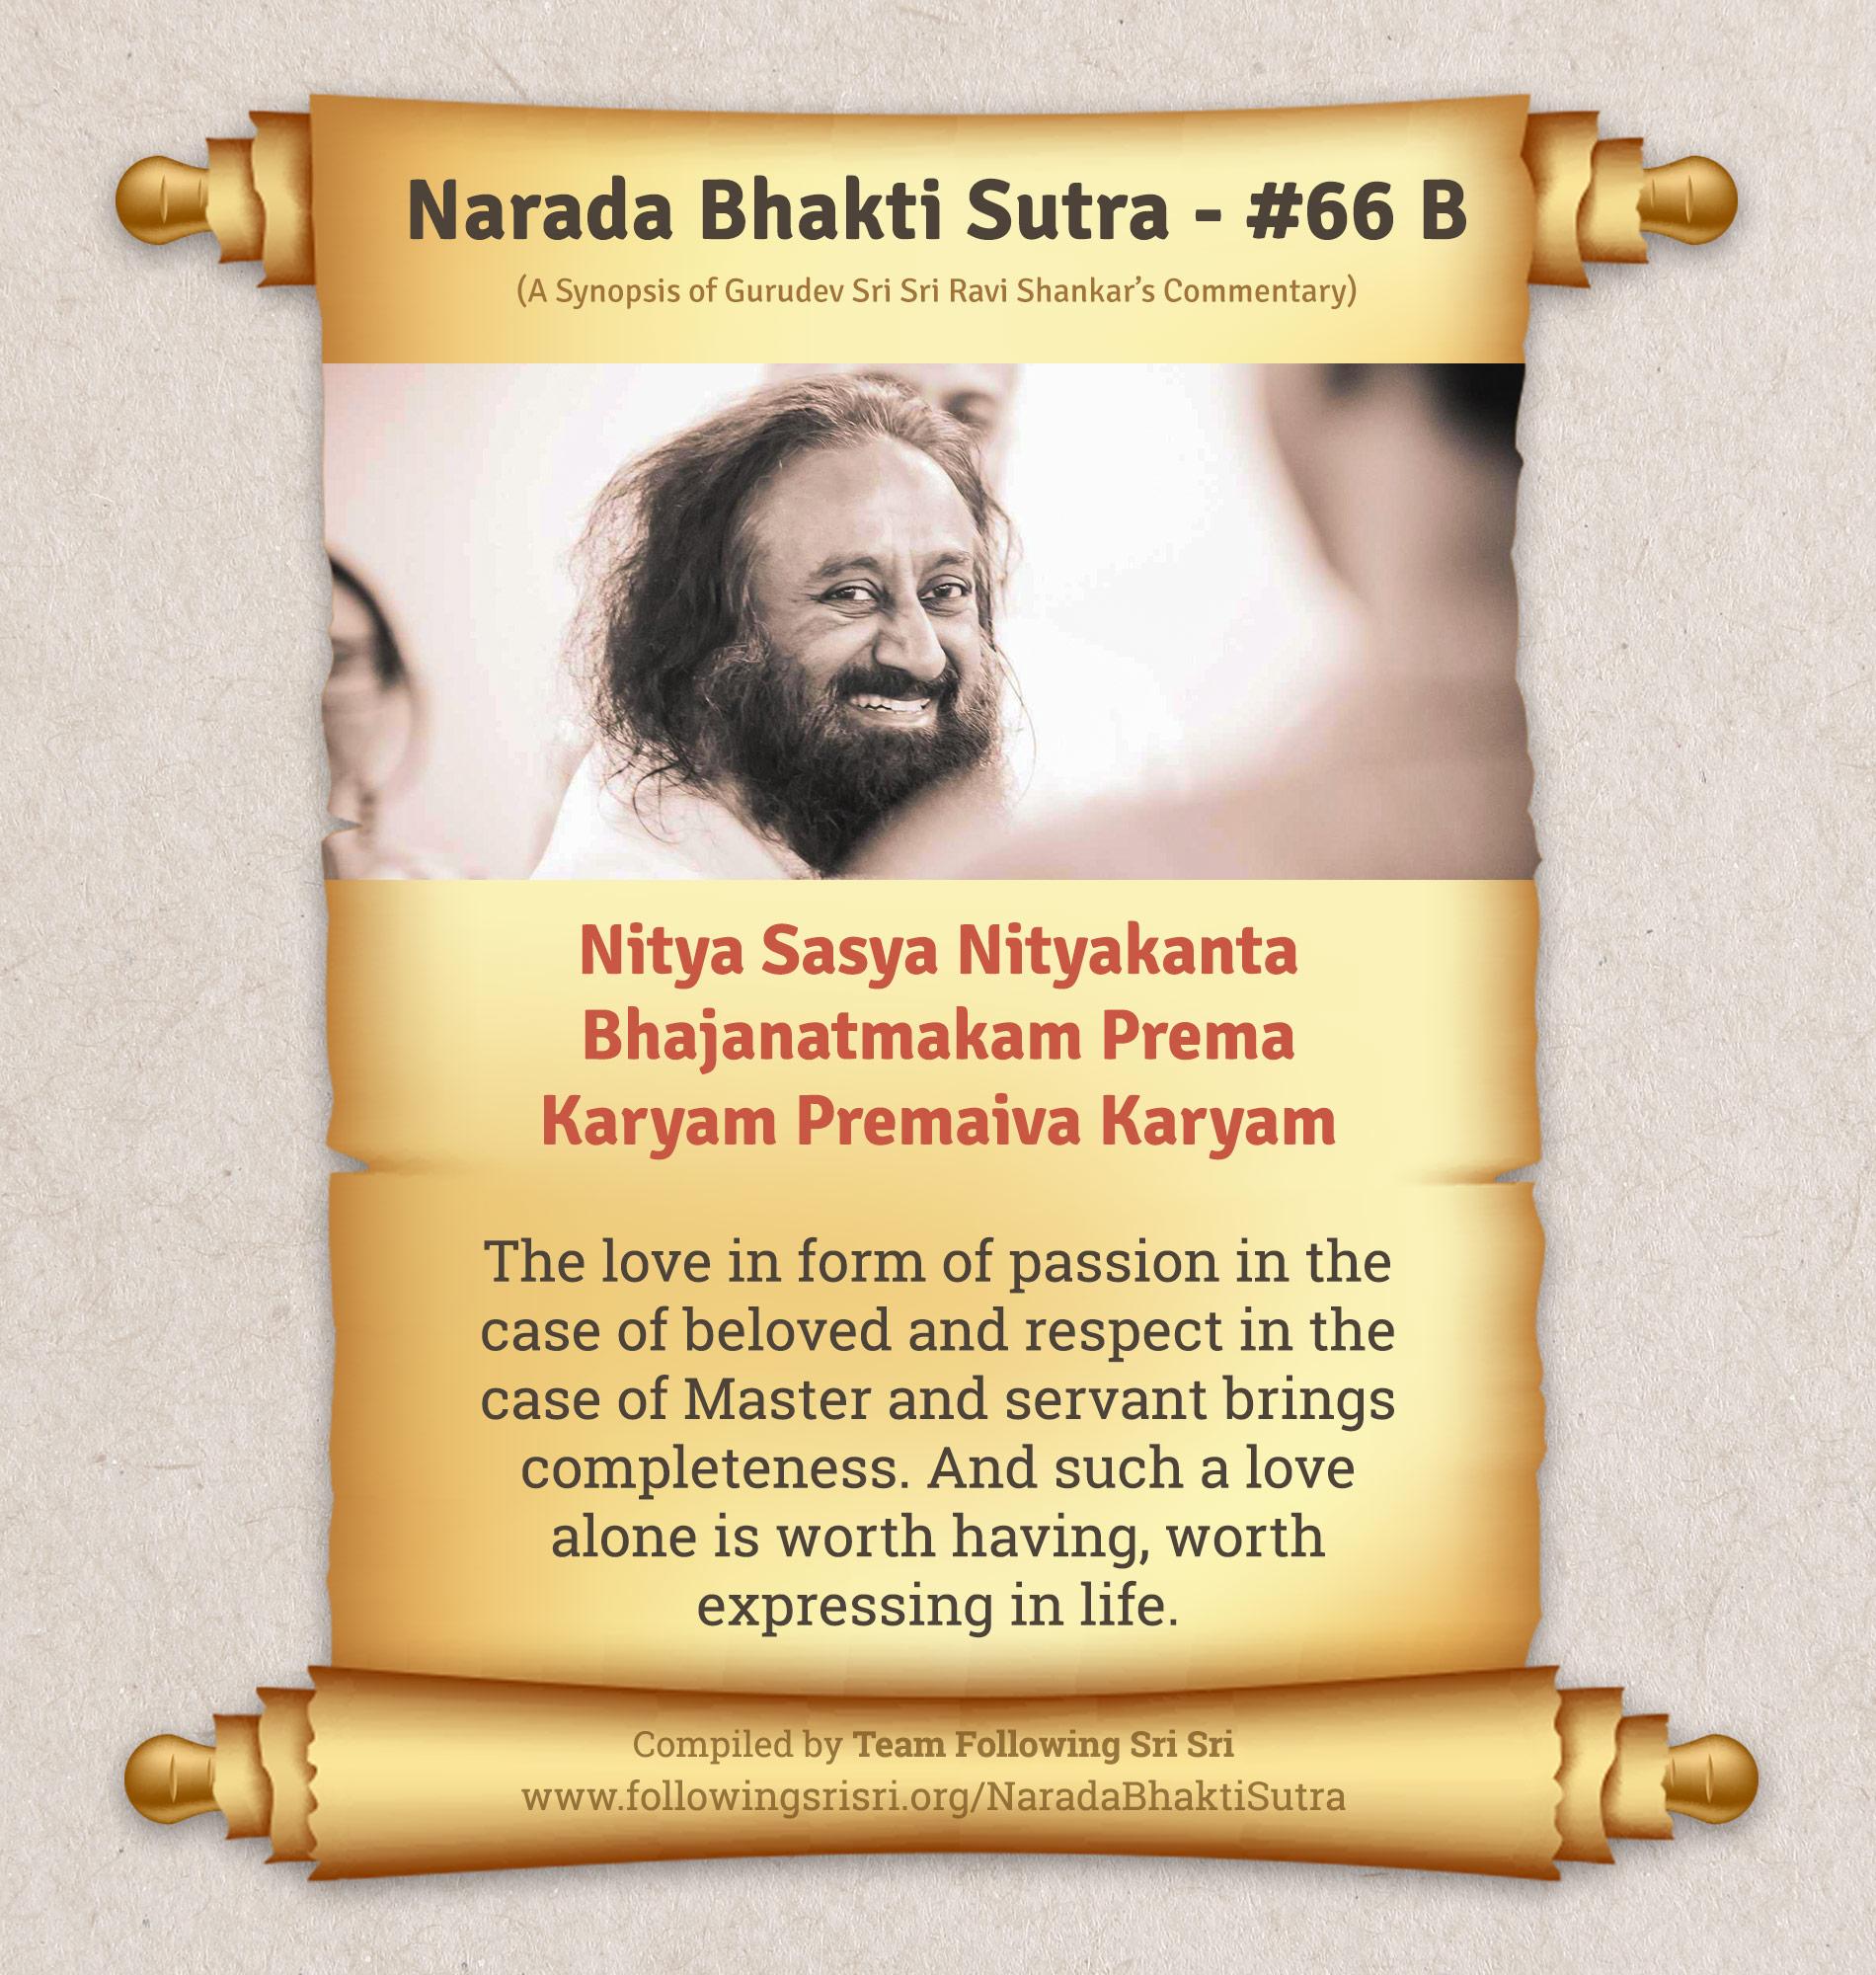 Narada Bhakti Sutras - Sutra 66 B